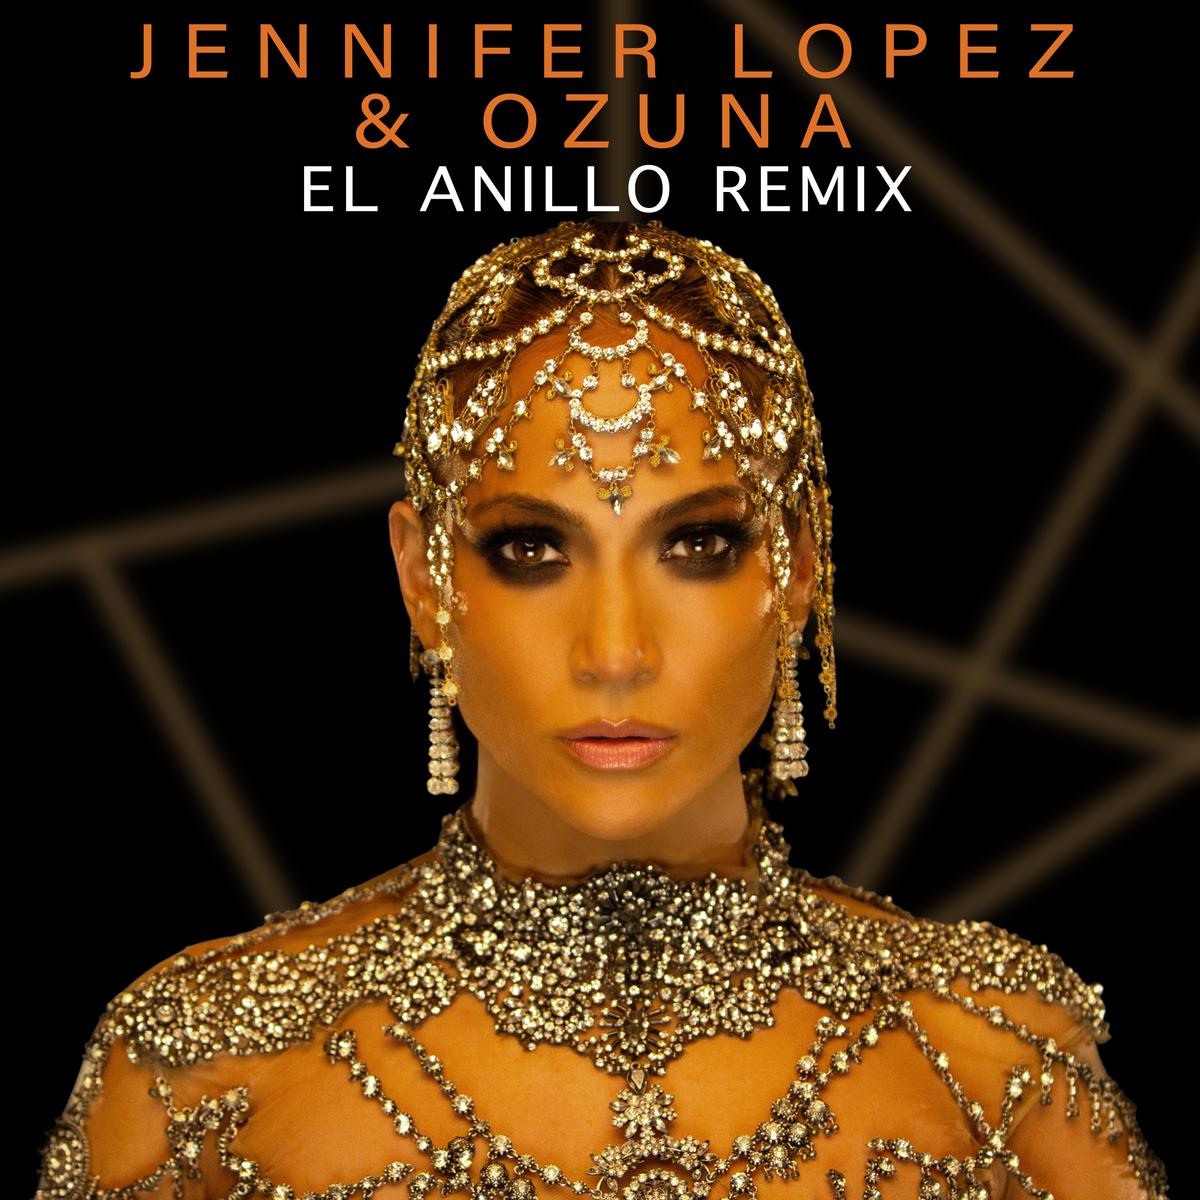 JLo_El_Anillo_Remix